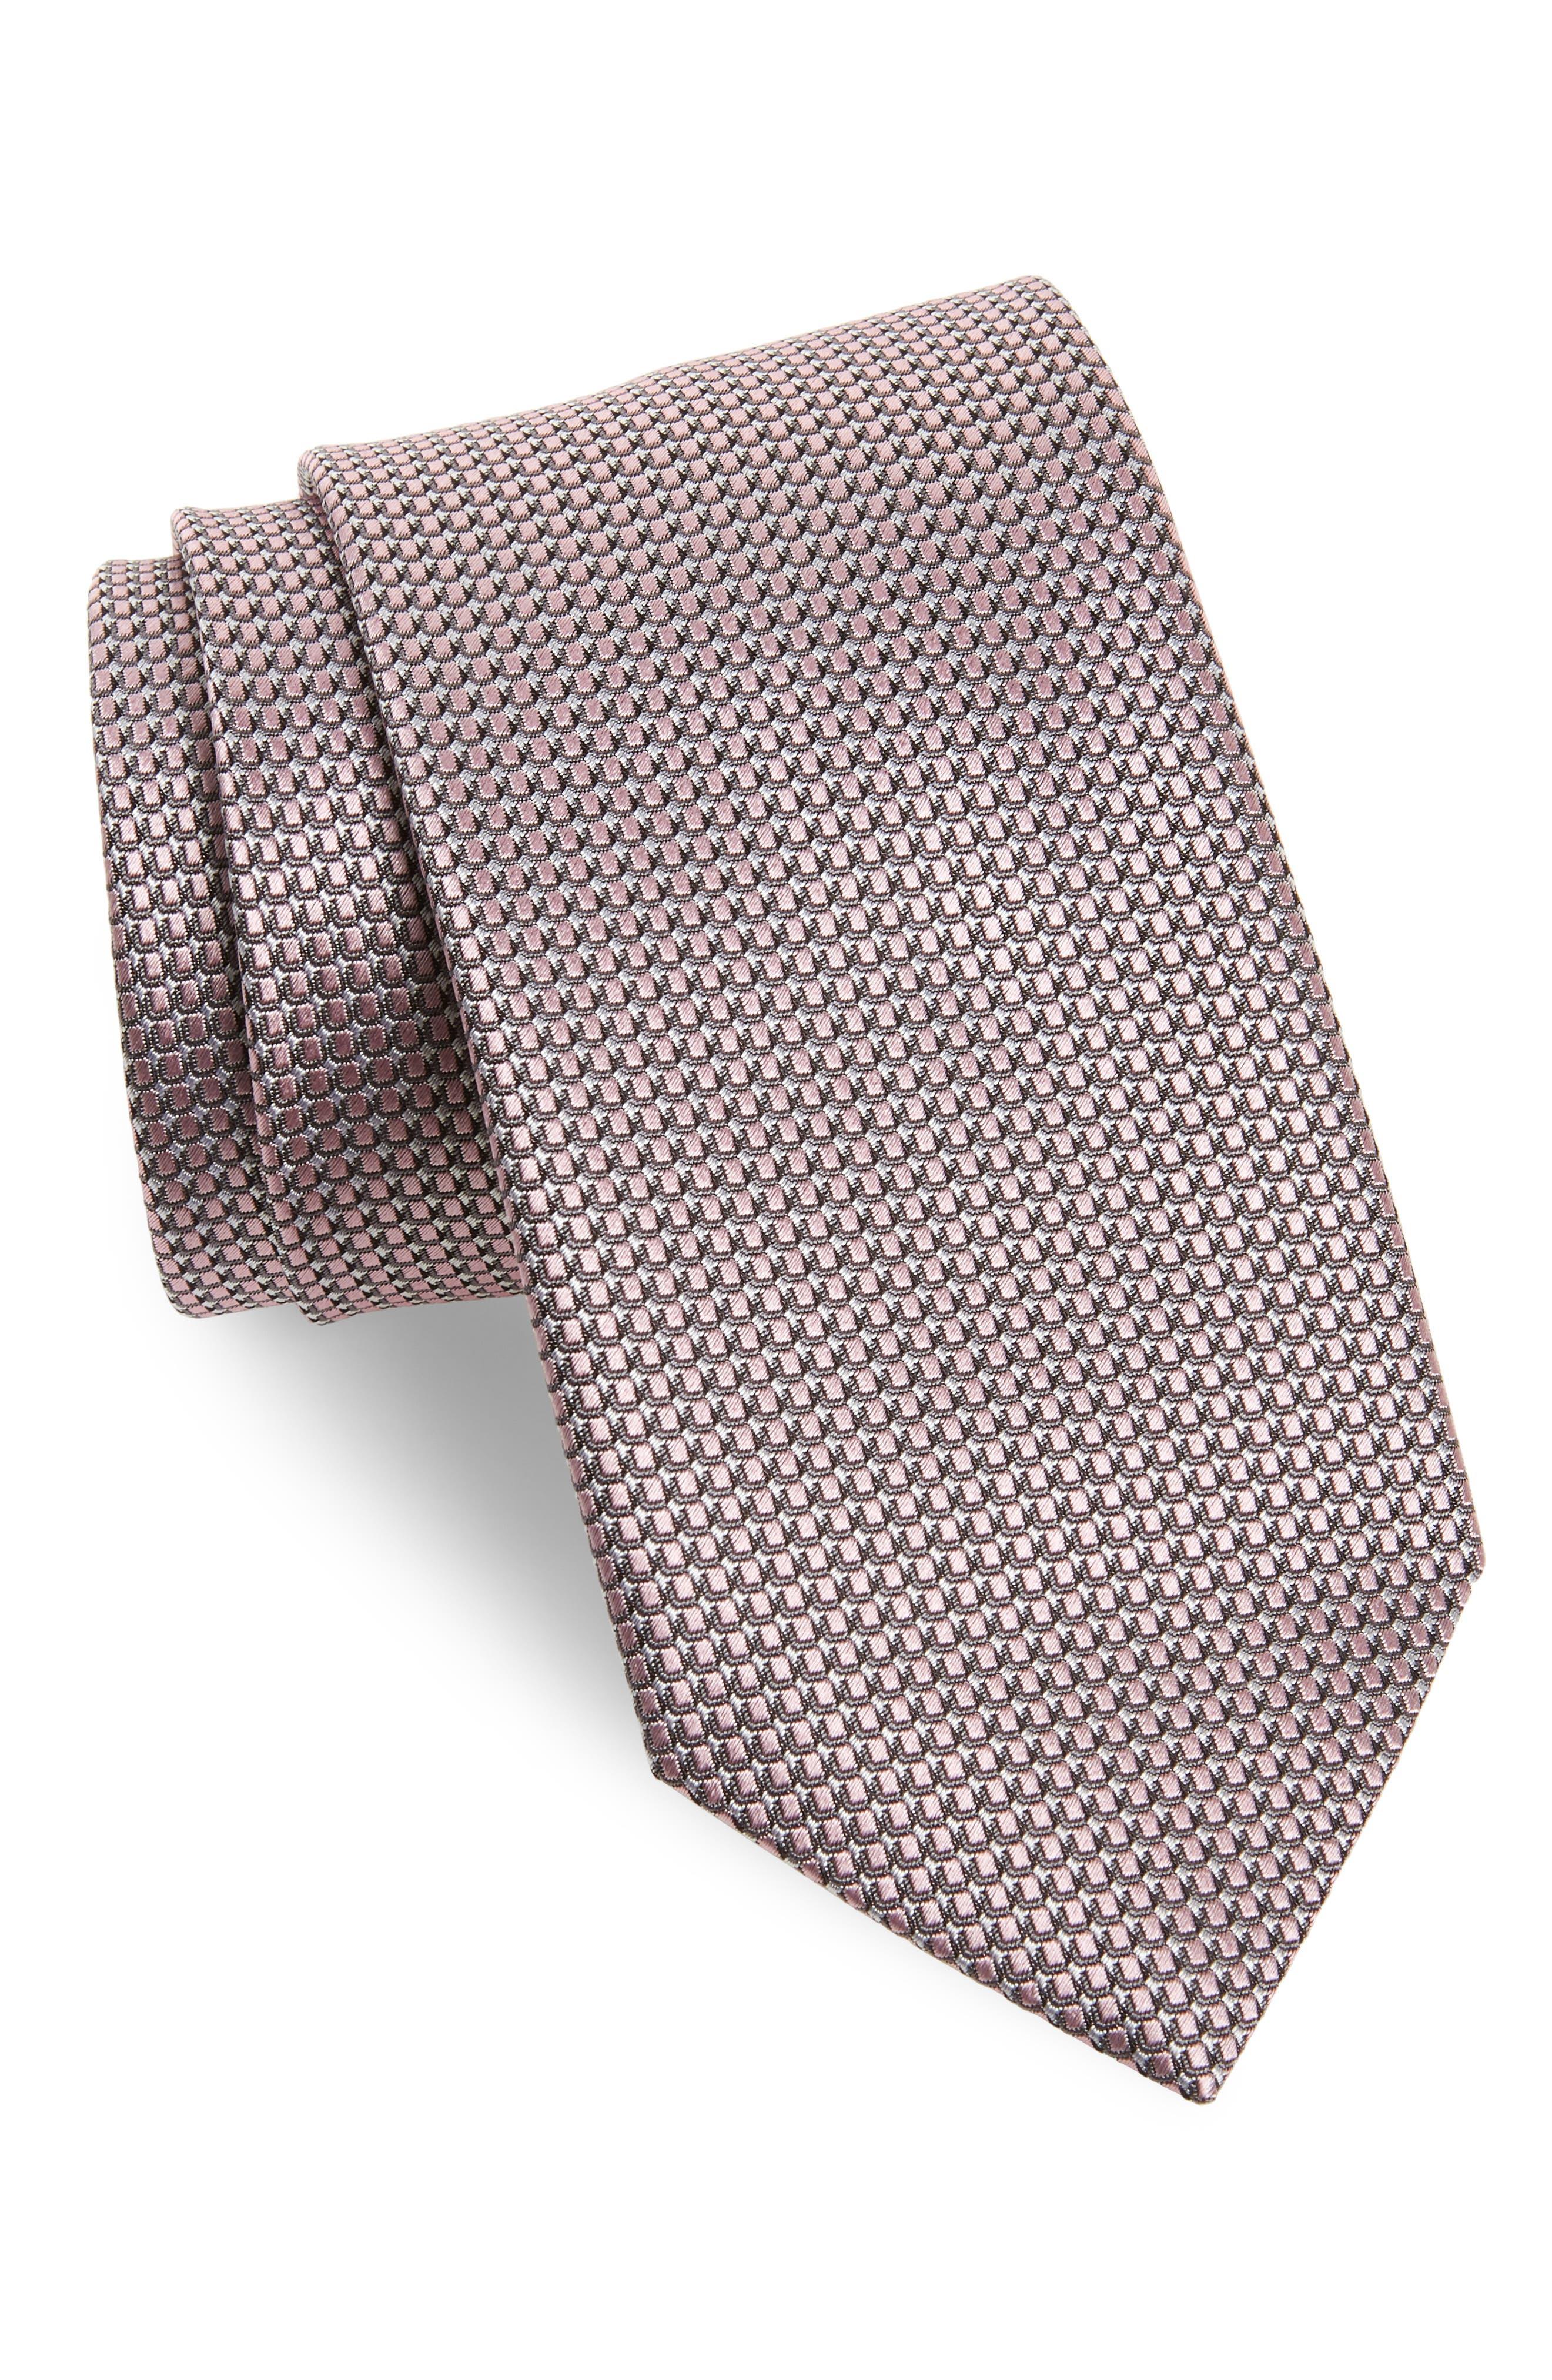 Main Image - Brioni Solid Silk Tie